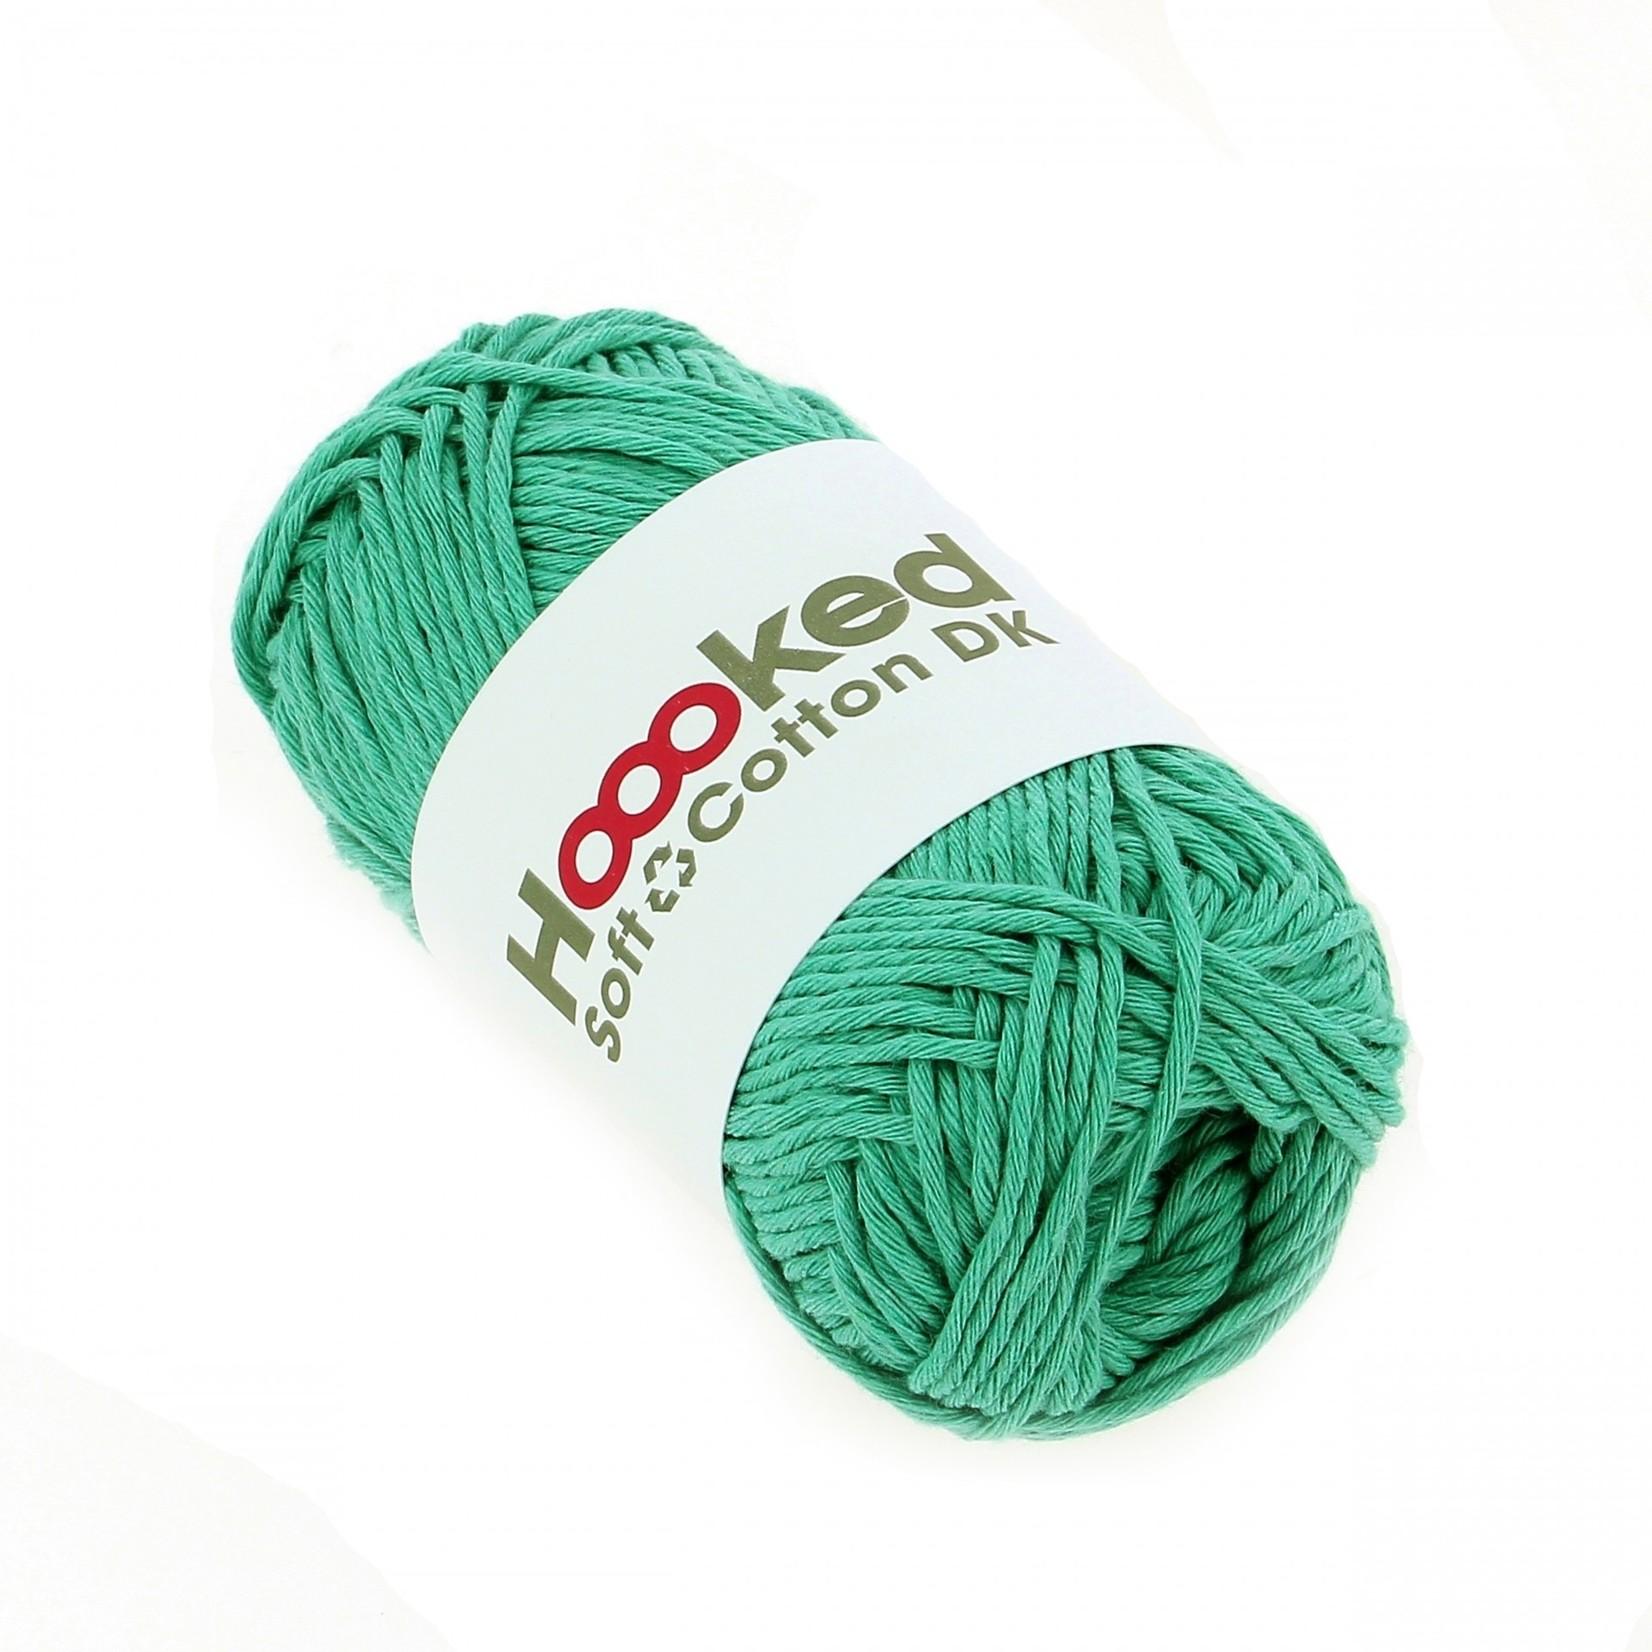 Hoooked Hoooked Soft Cotton DK Tokio Turquoise bundel 5 x 50 gr. / 85 m.